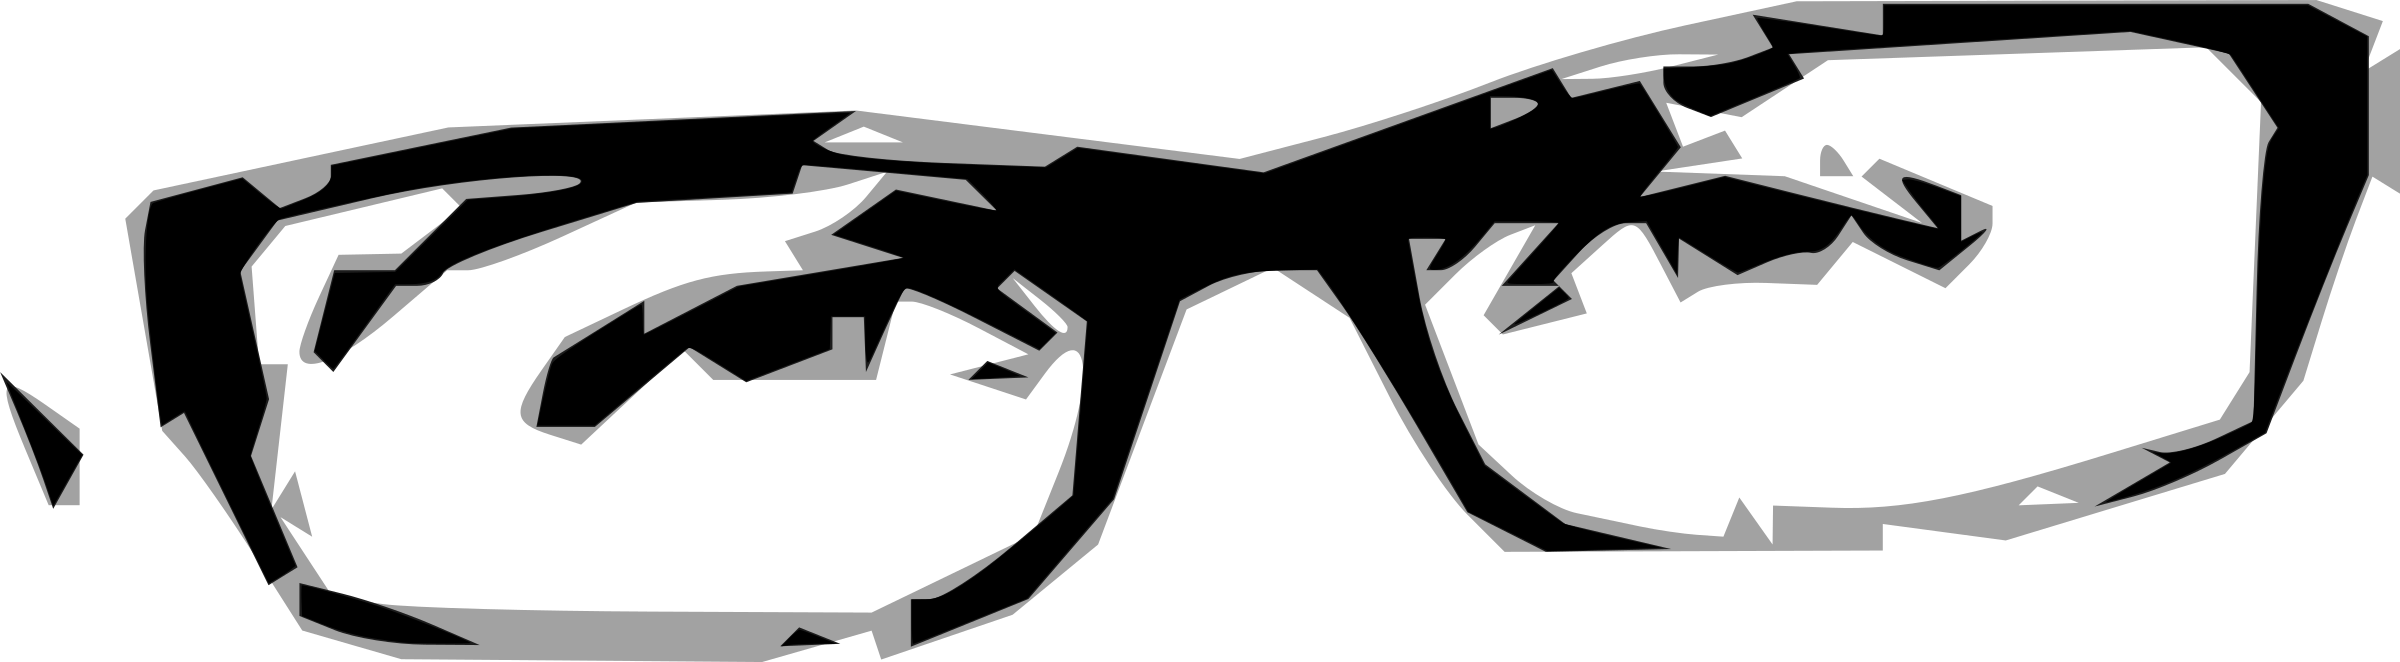 Eyeballs clipart glass. Glasses with eyes big